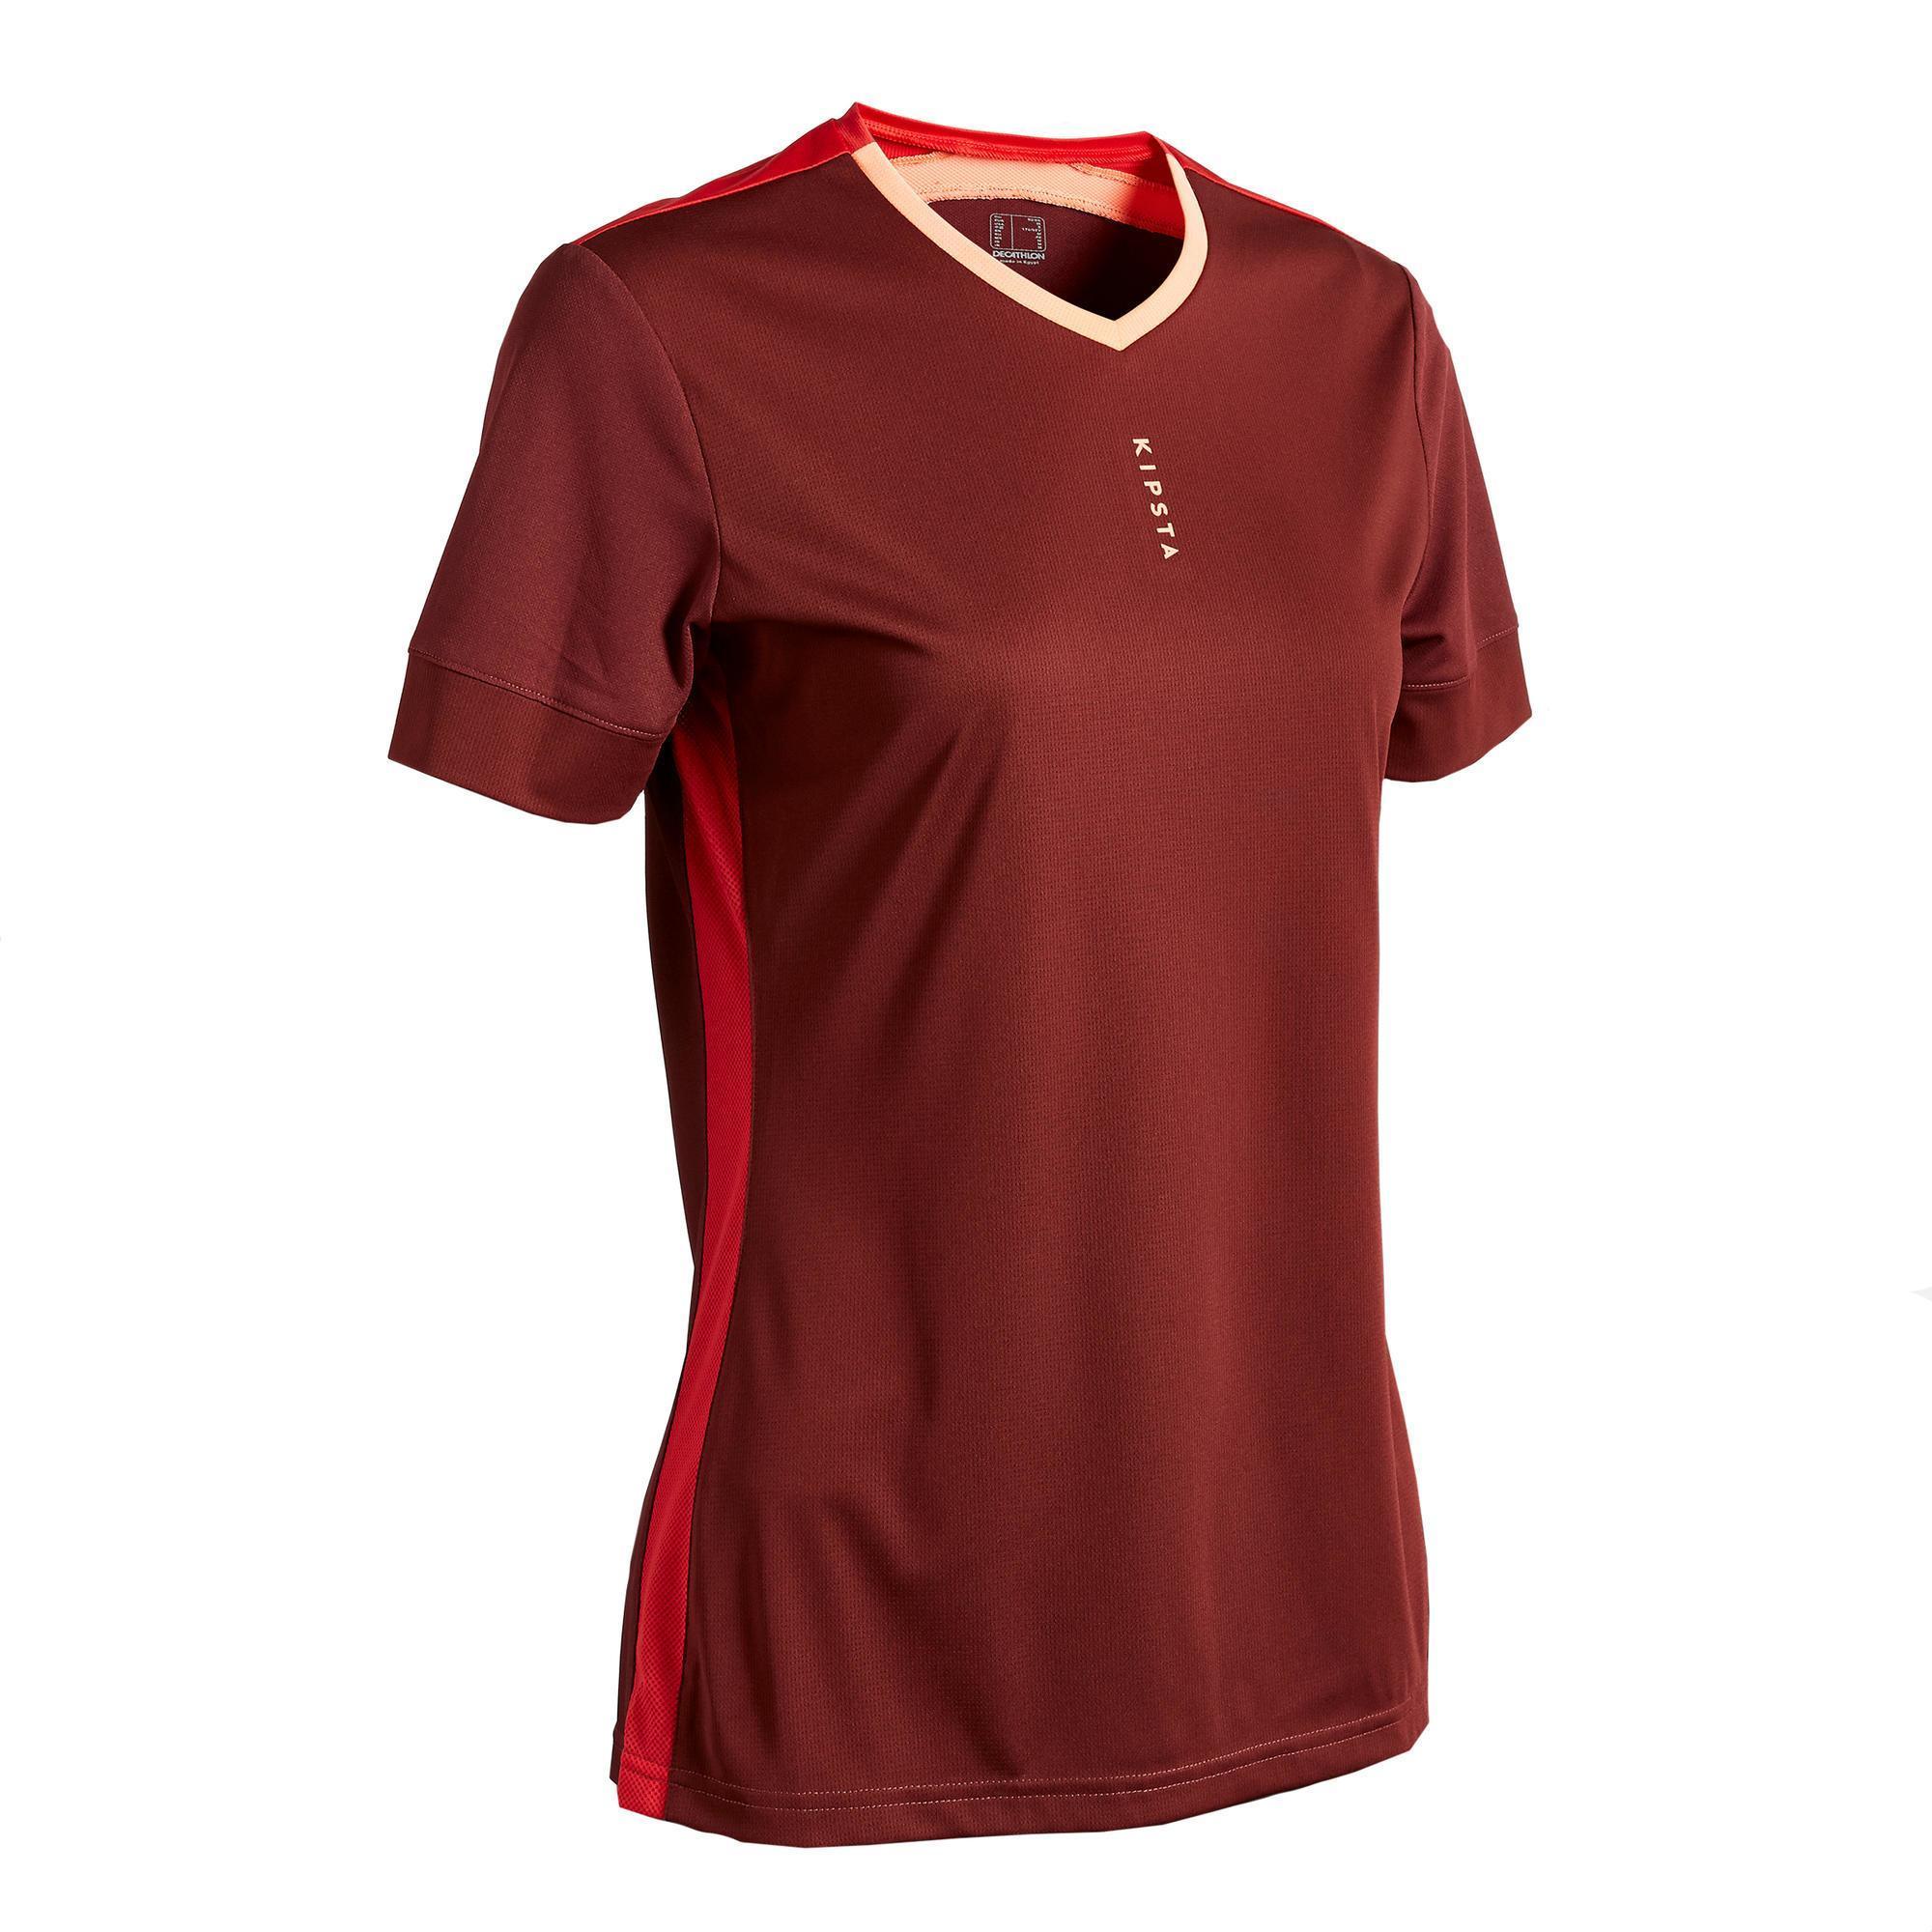 Fußballtrikot F500 Damen   Sportbekleidung > Trikots   Kipsta